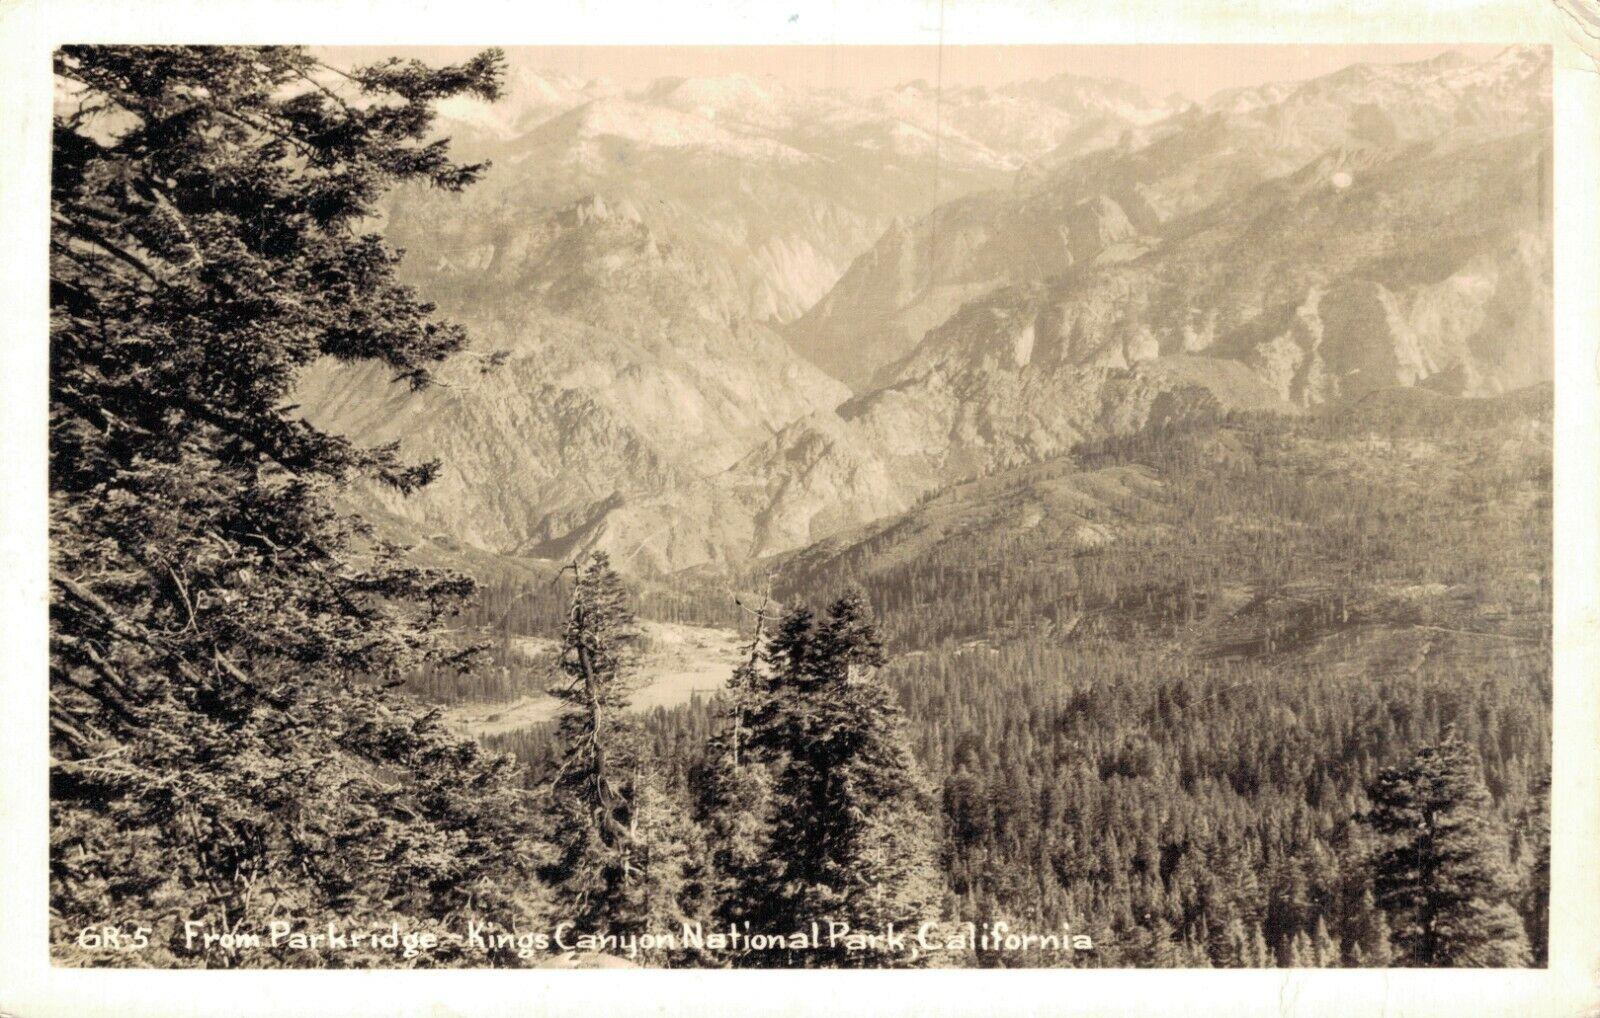 USA From Park Bridge Kings Canyon National Park California RPPC 04.29